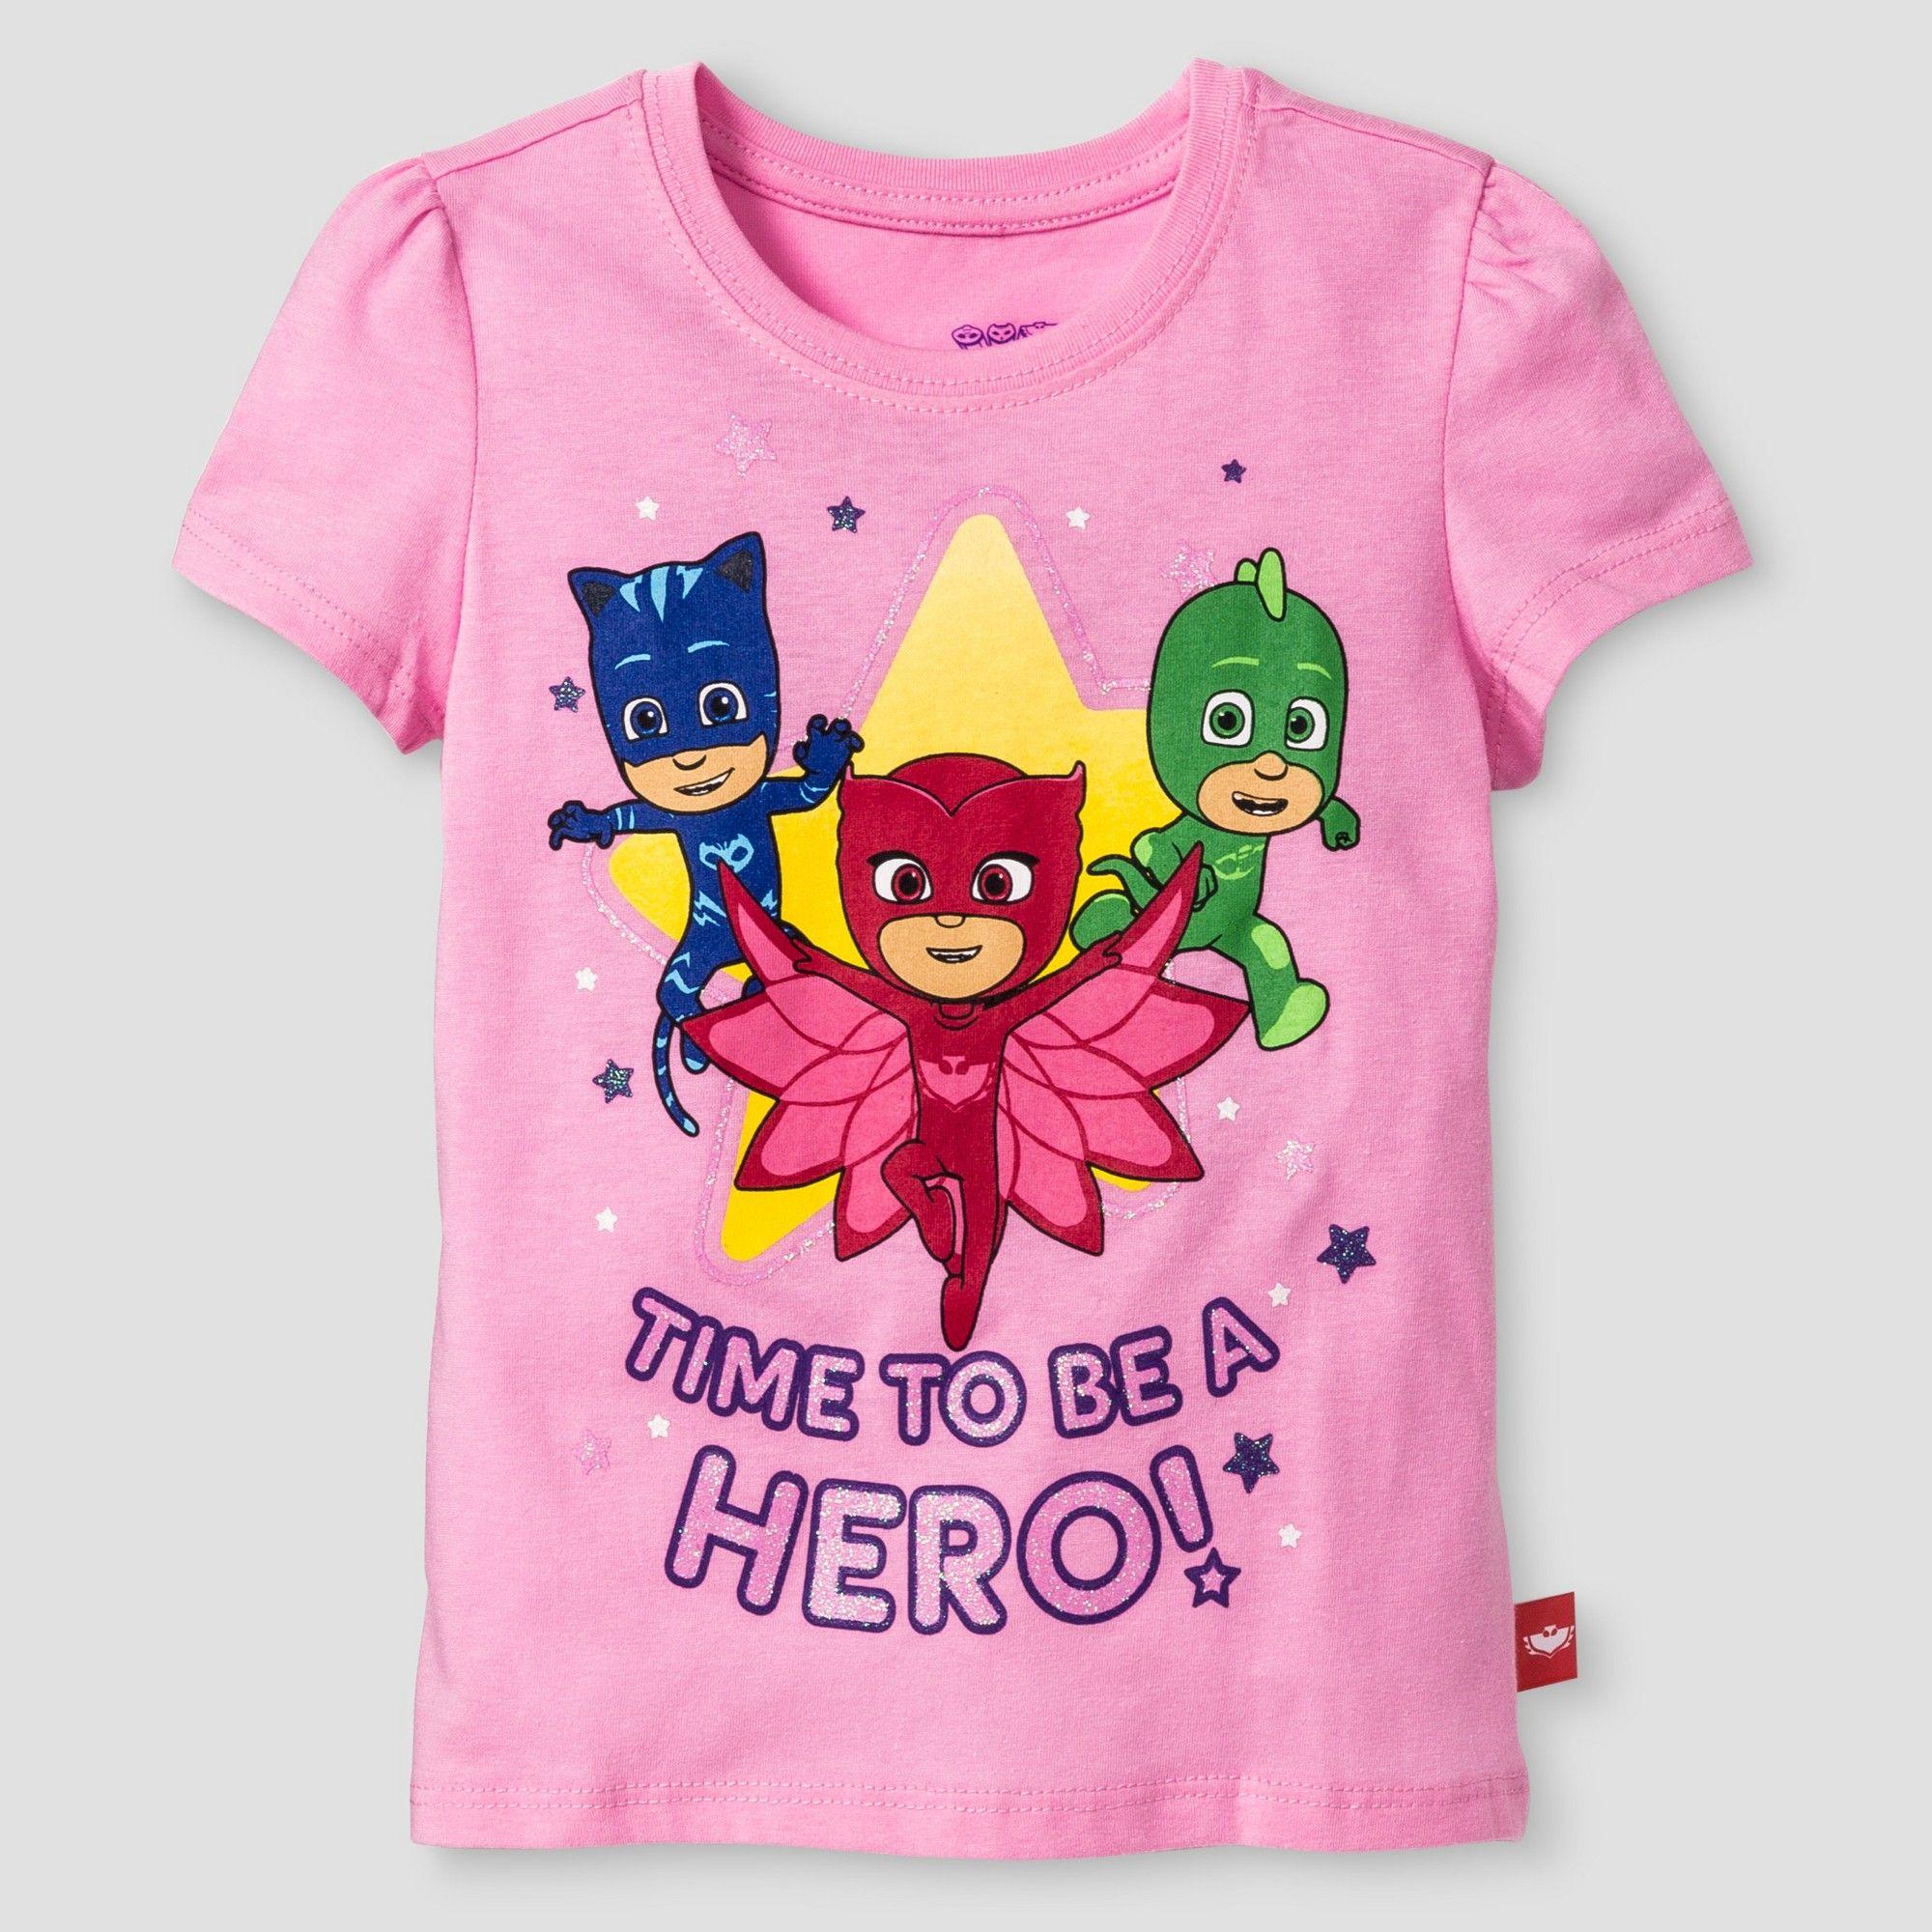 d32bf293e Toddler Girls' PJ Masks Short Sleeve T-Shirt 2T - Pink | Products ...